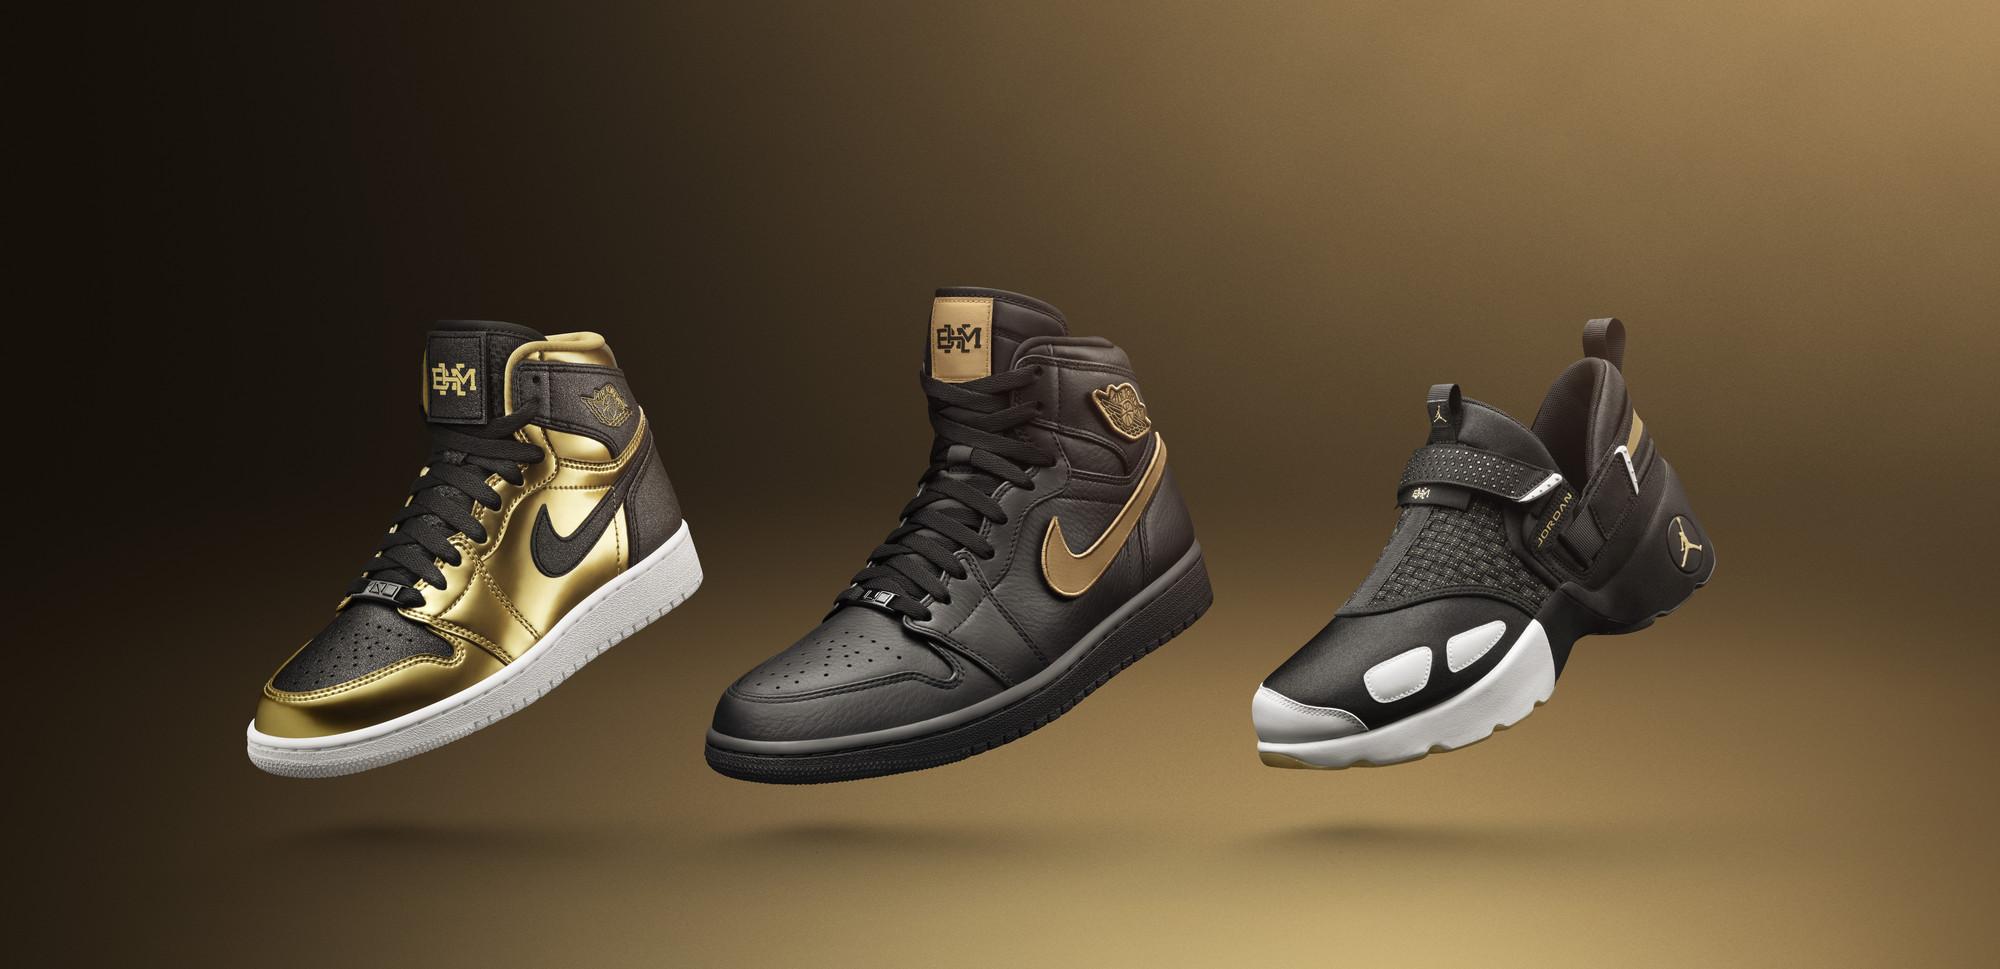 Air Jordan BHM Collection